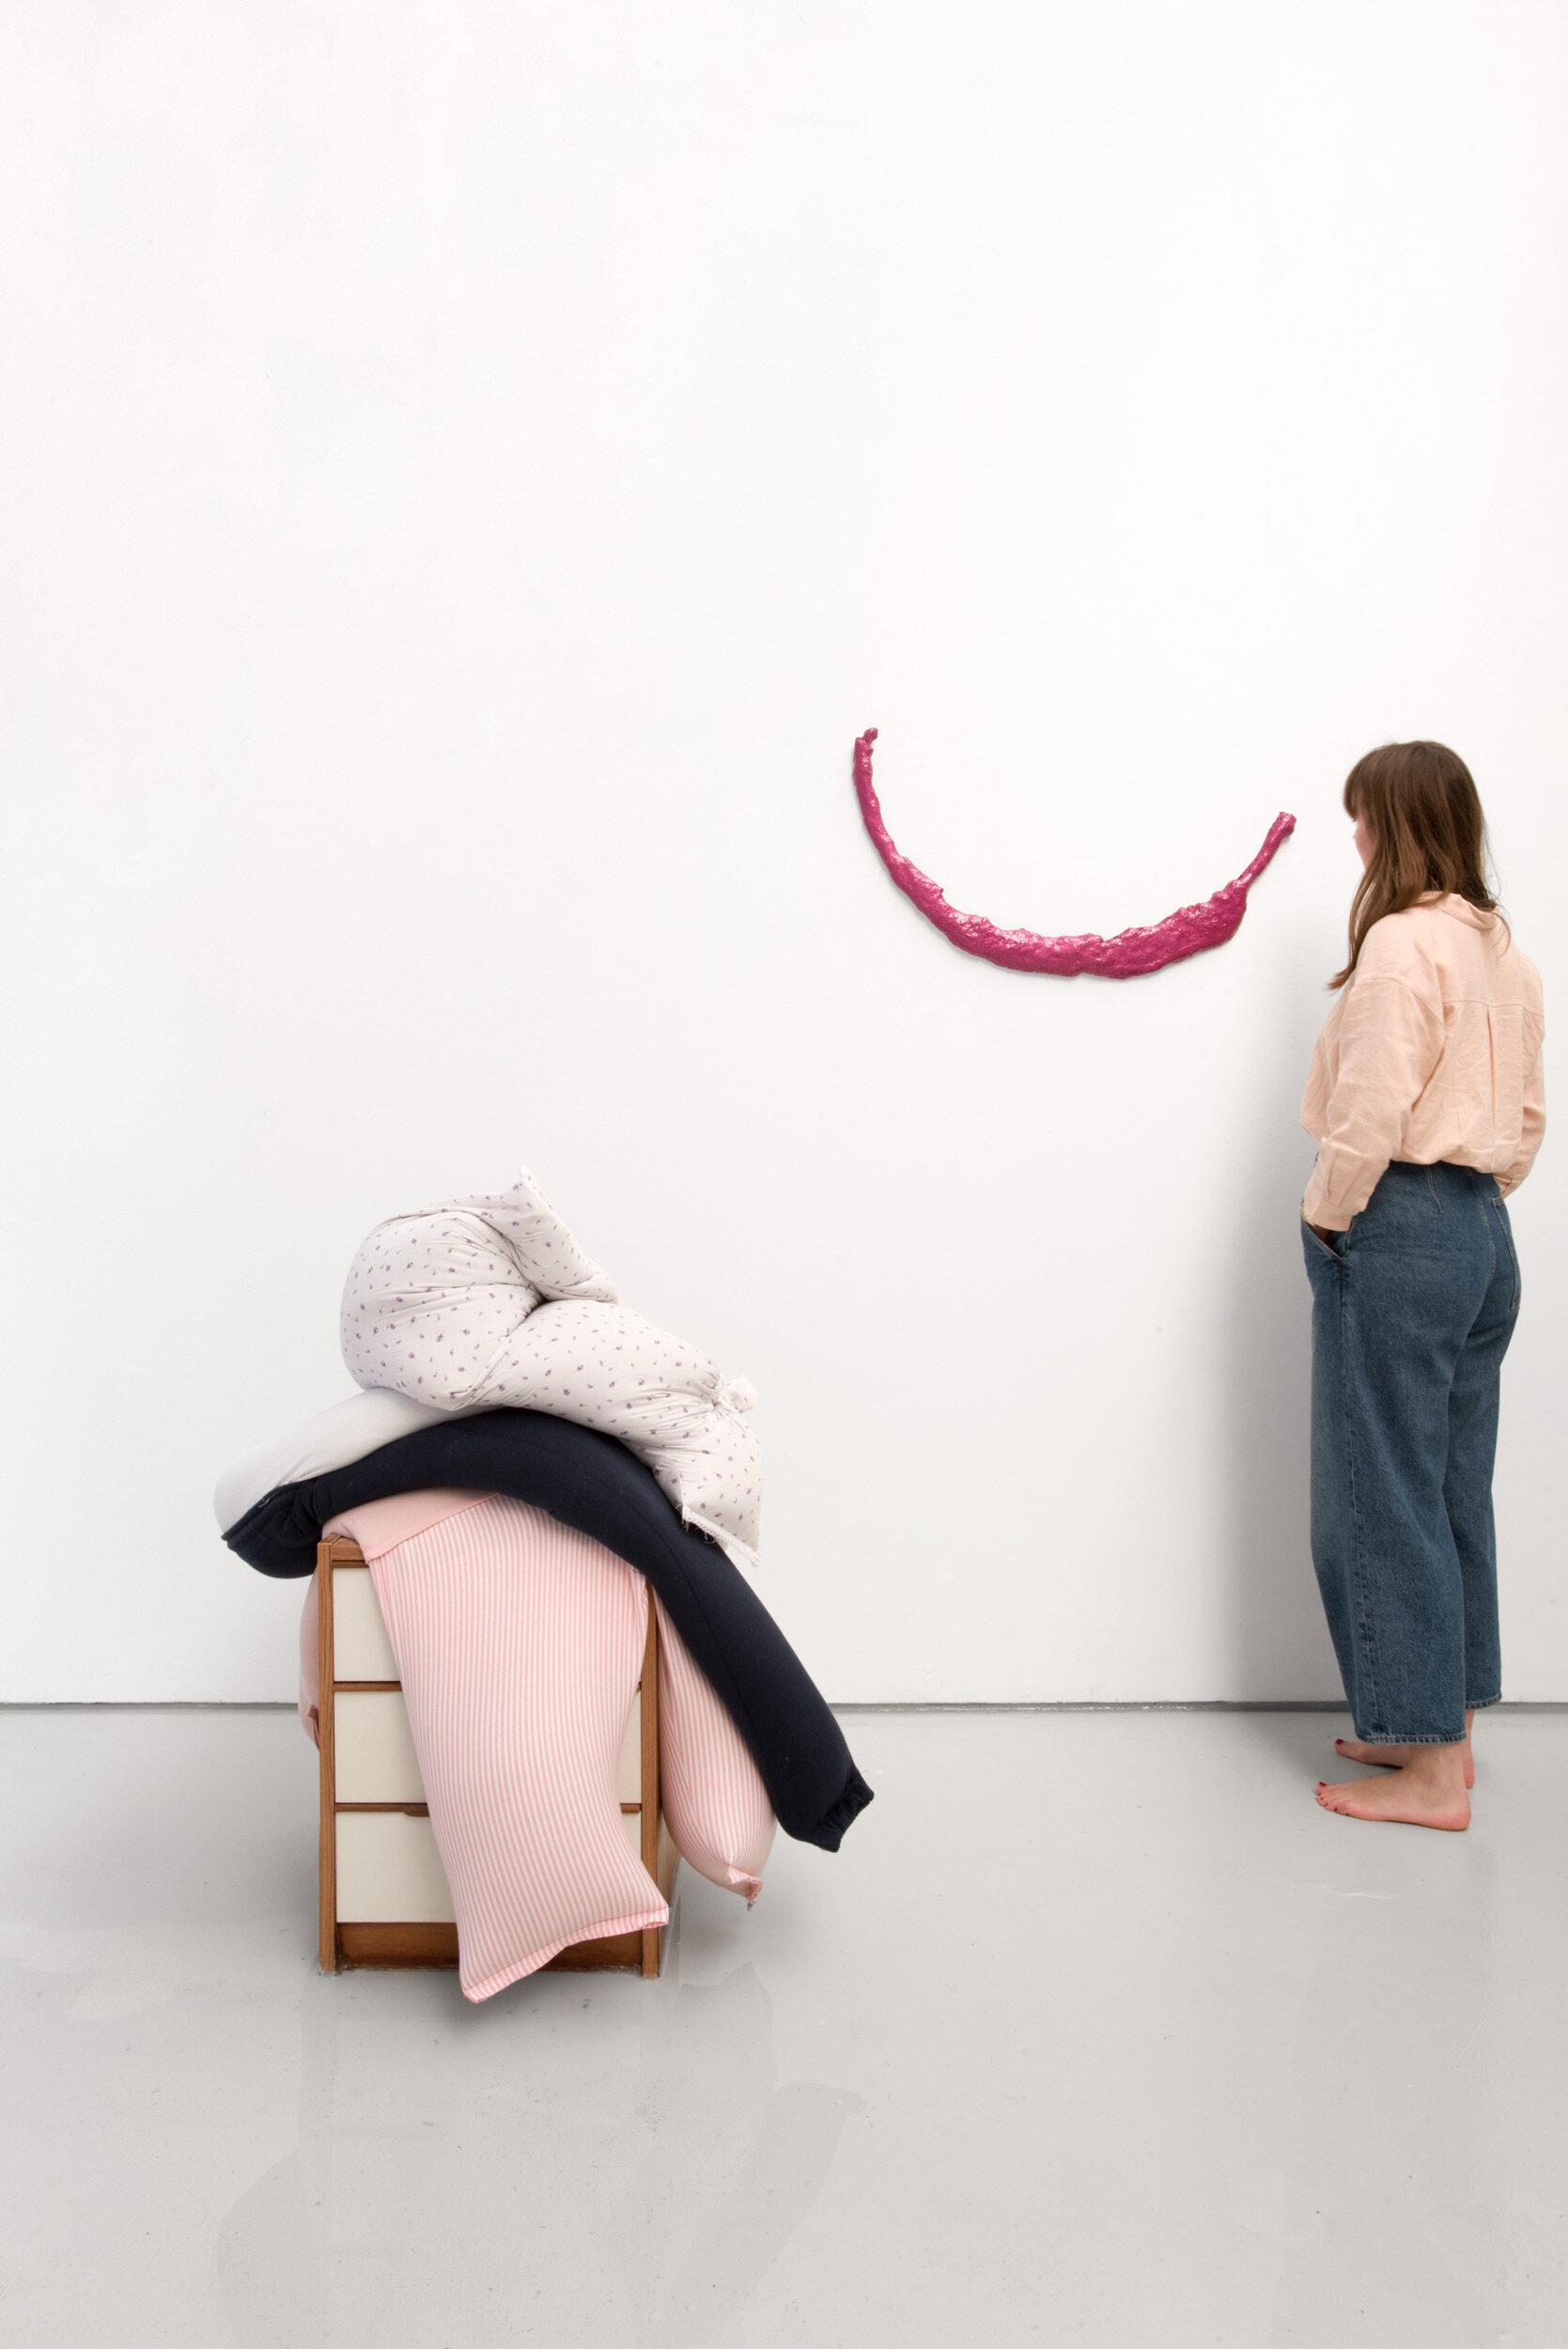 Fall, slump, drop on a bedside cabinet in water[...], Installation View, Alex Farrar, Bloc Projects, 2019, 3.jpg